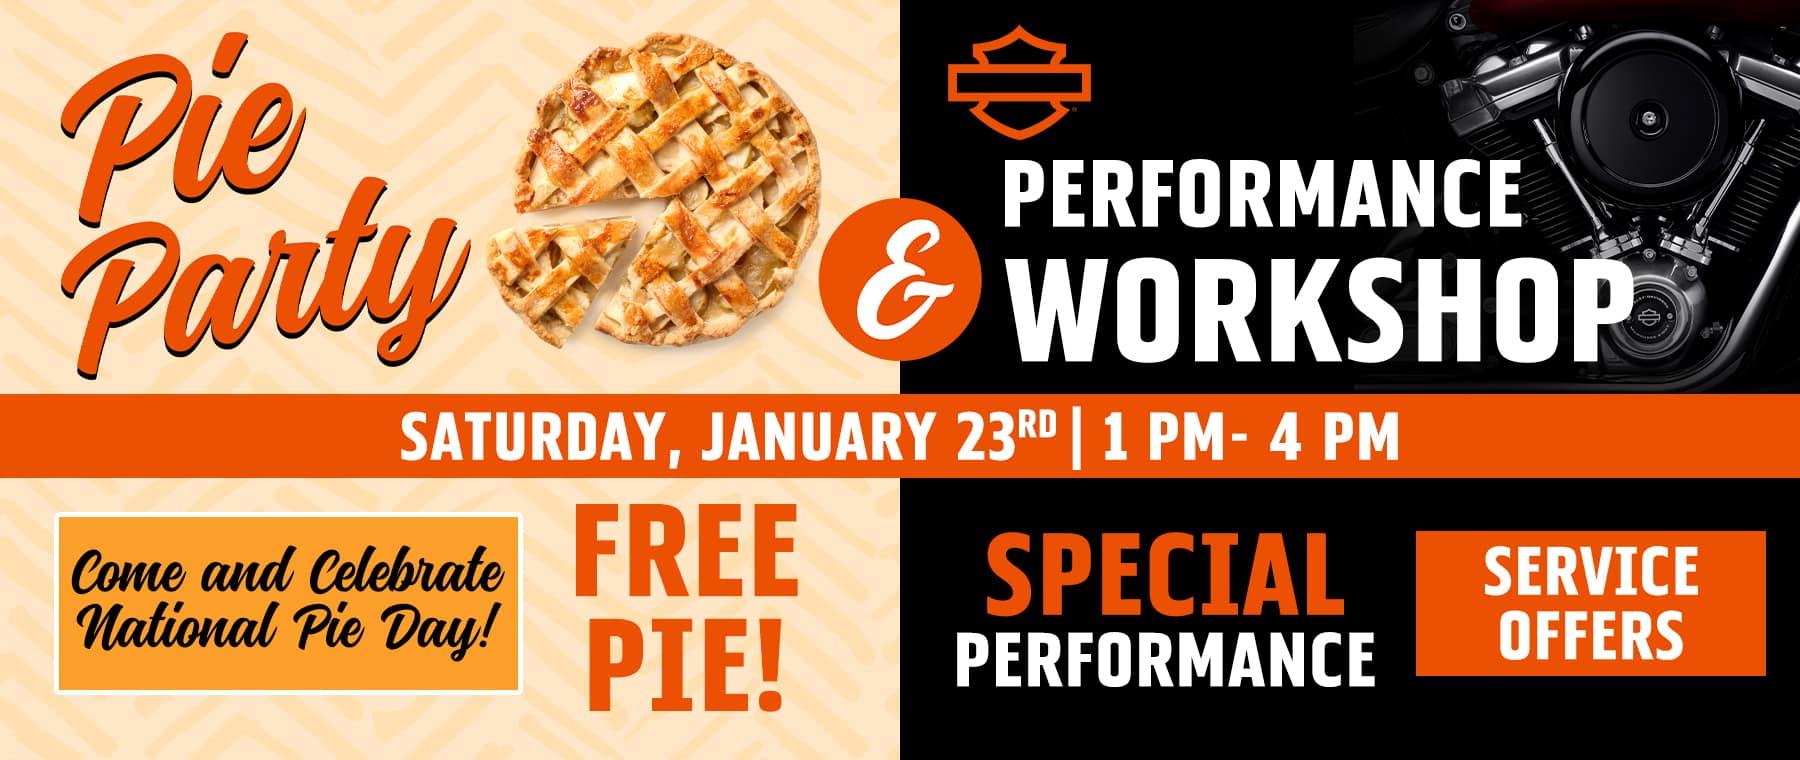 Pie Party & Performance Workshop_Slide